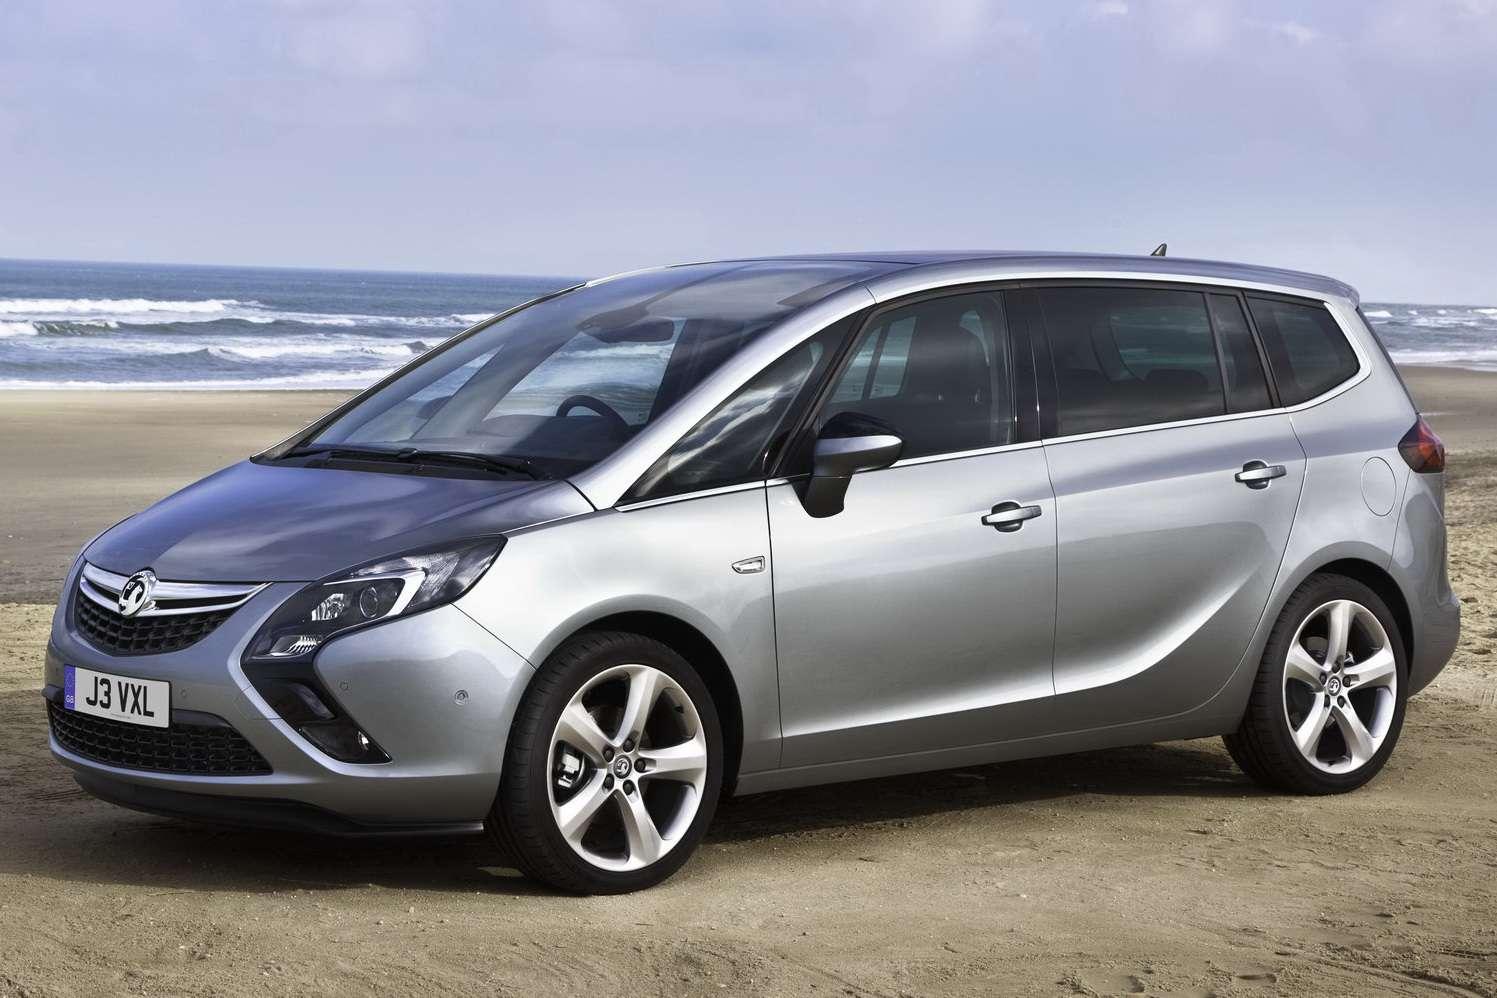 2012 Opel Zafira 7 osobowa maj 2011